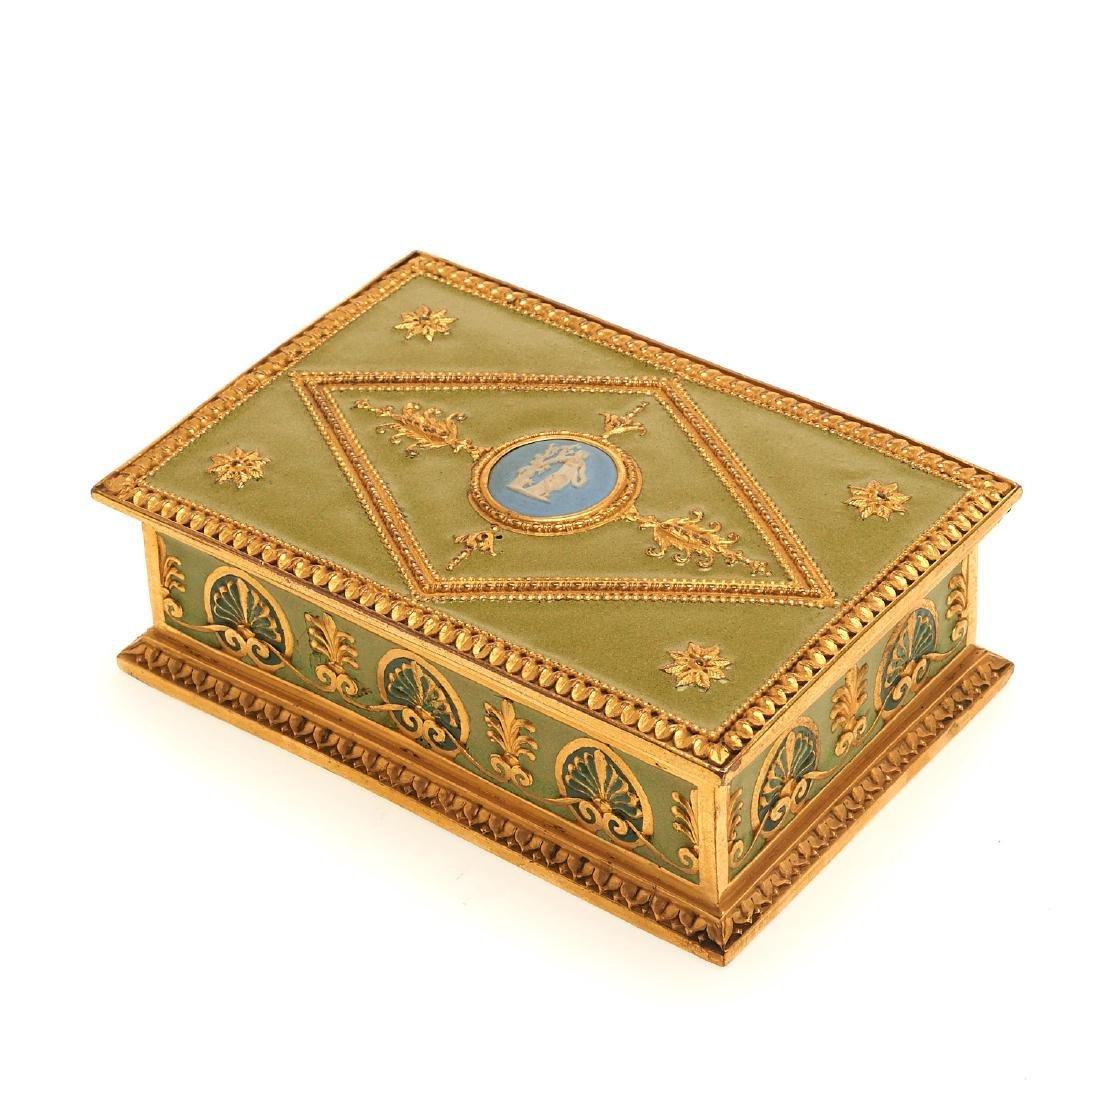 E.F. Caldwell enamel and gilt bronze box